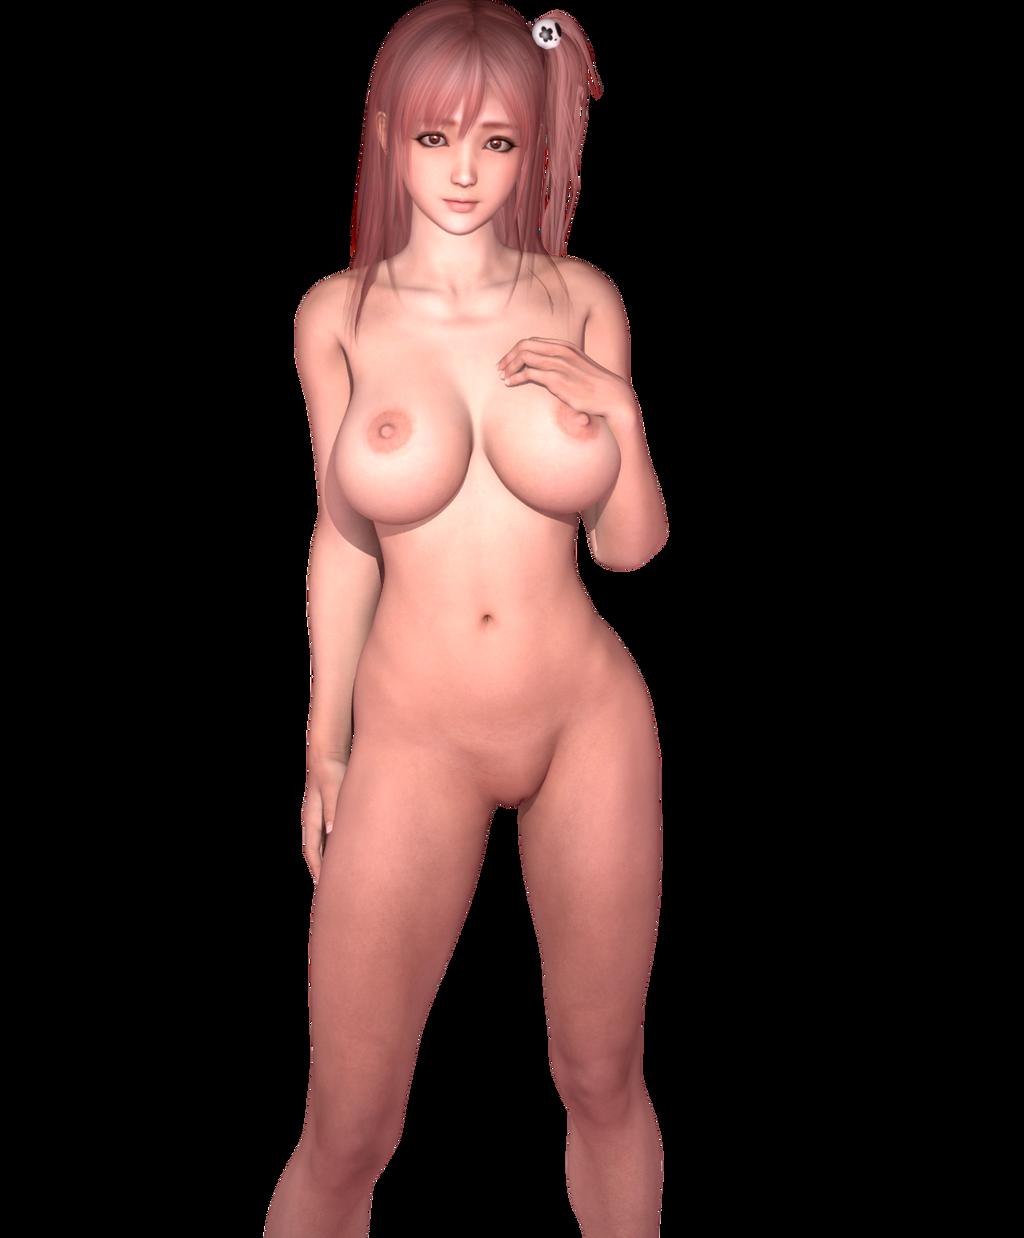 jessica rabbit nude sex